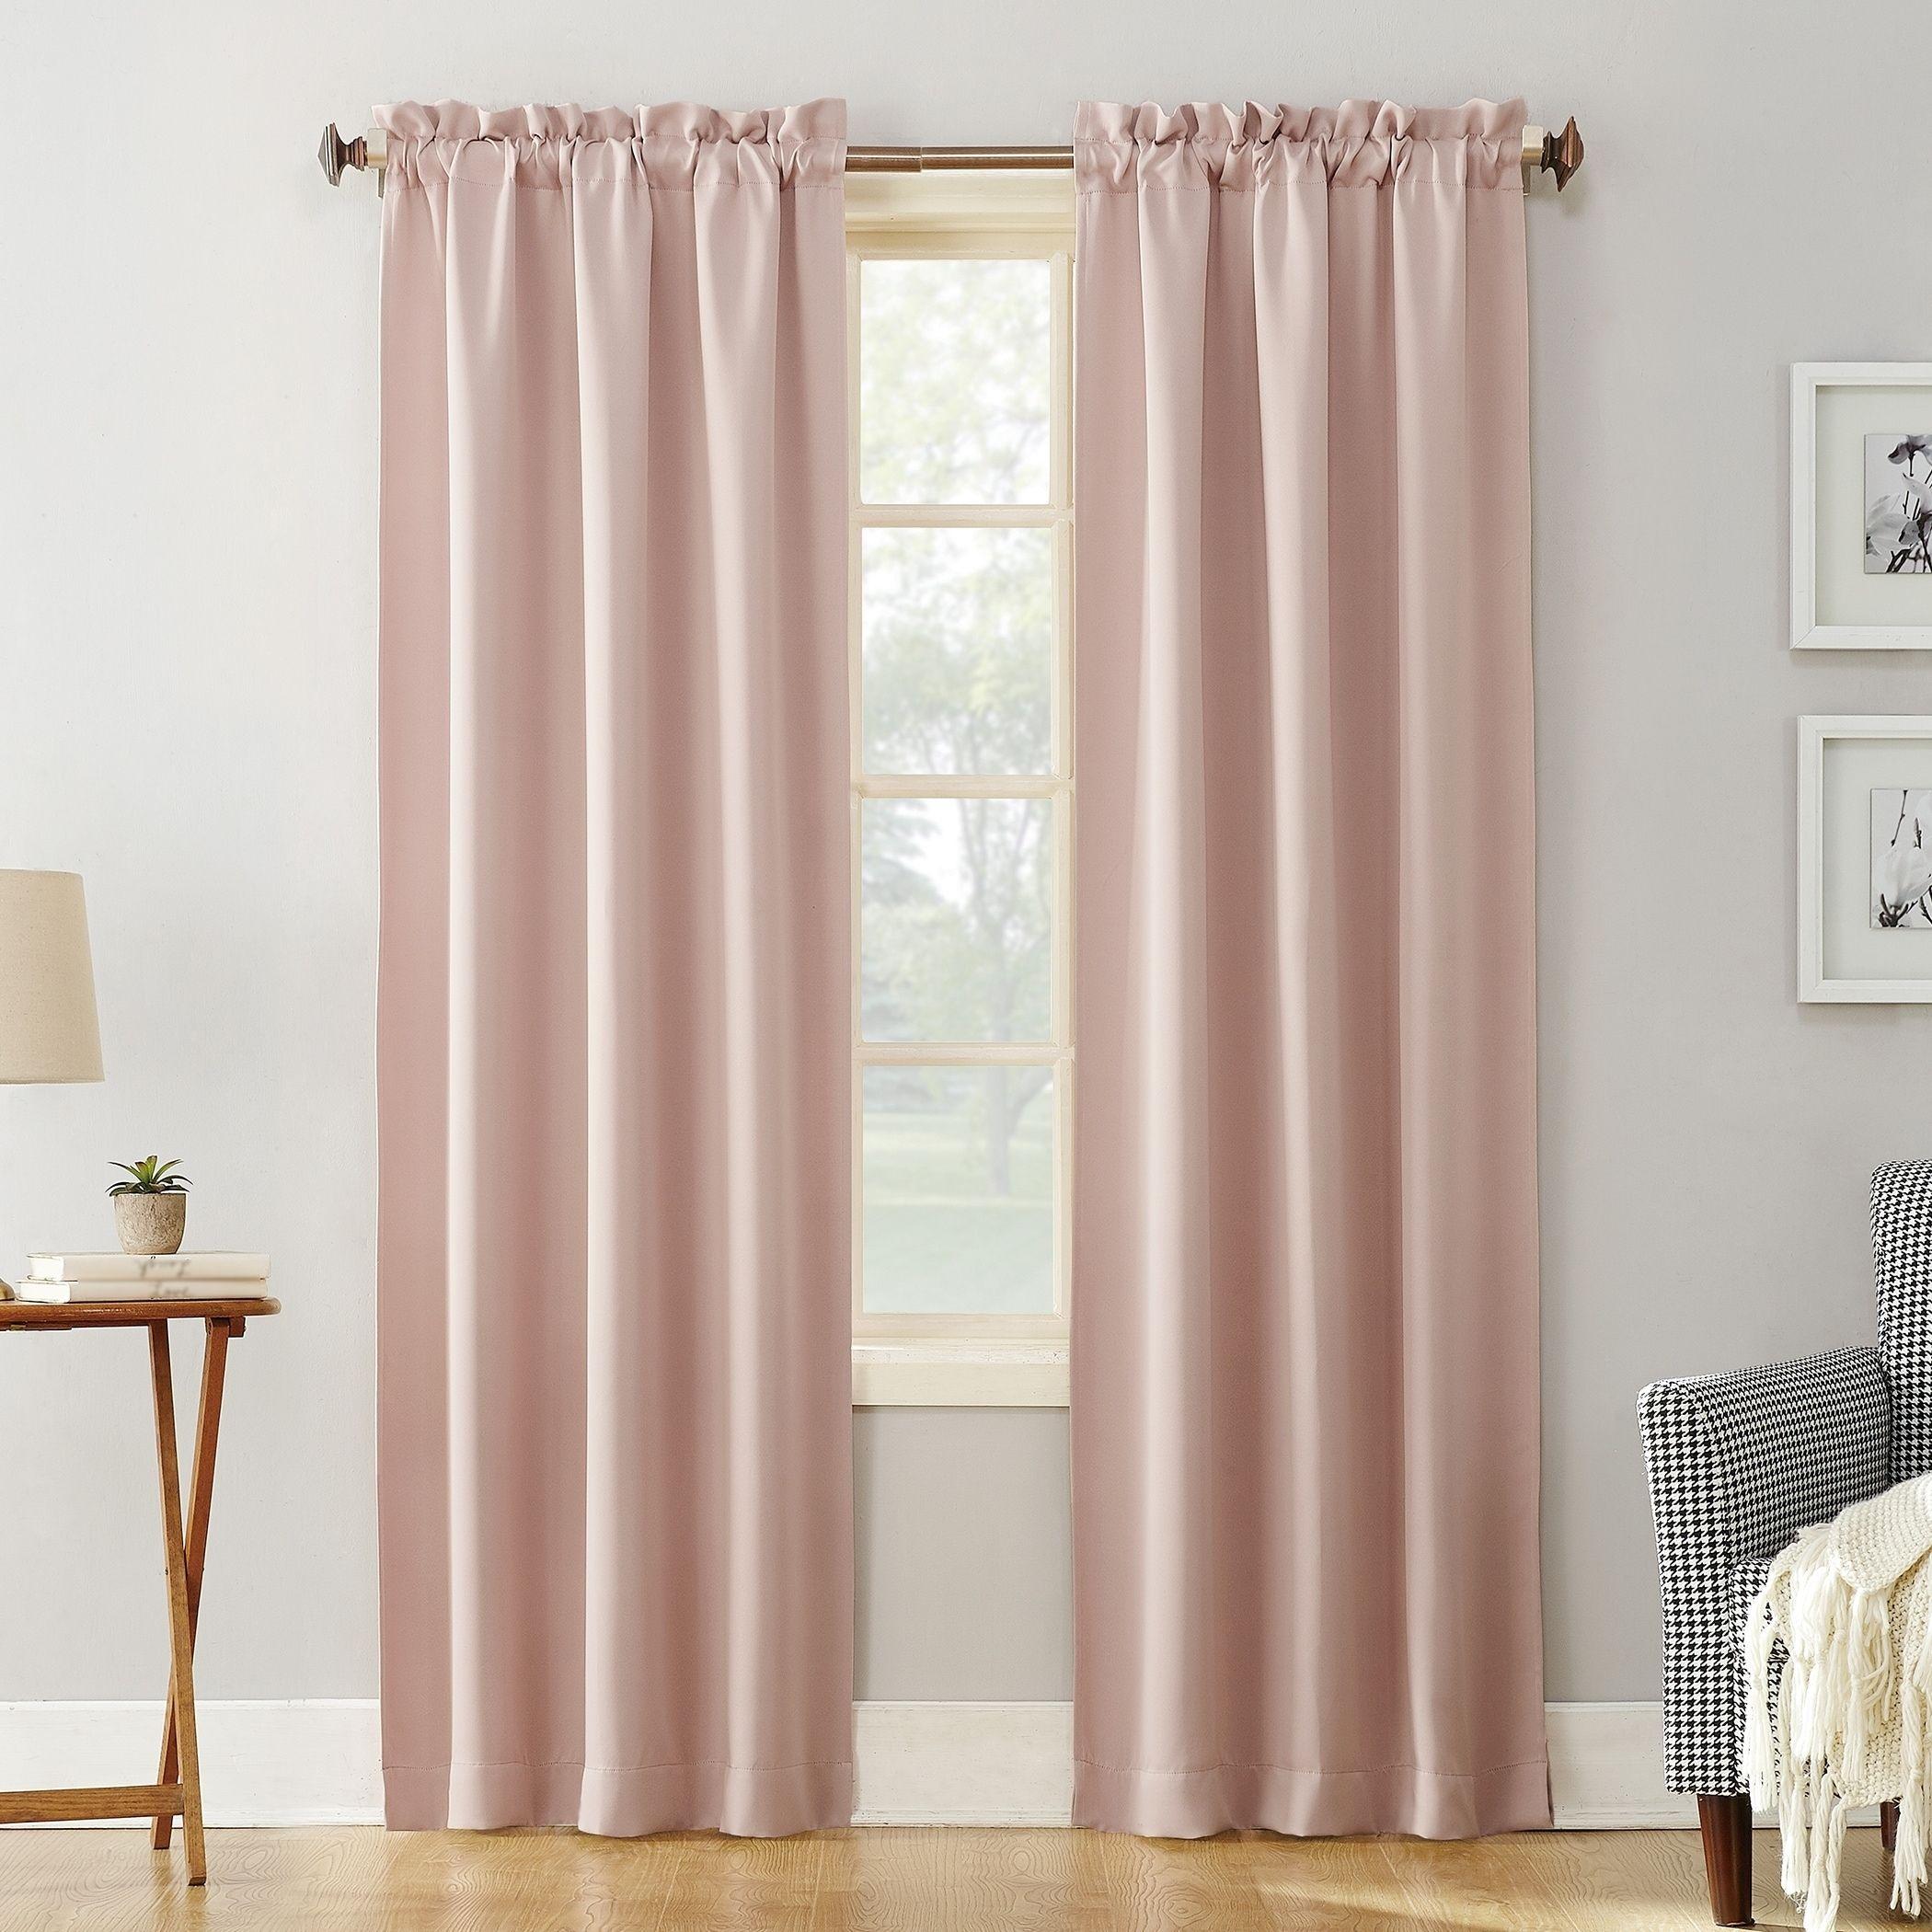 Sun zero hayden rod pocket blackout panel pearl 84 - Blackout curtains for master bedroom ...